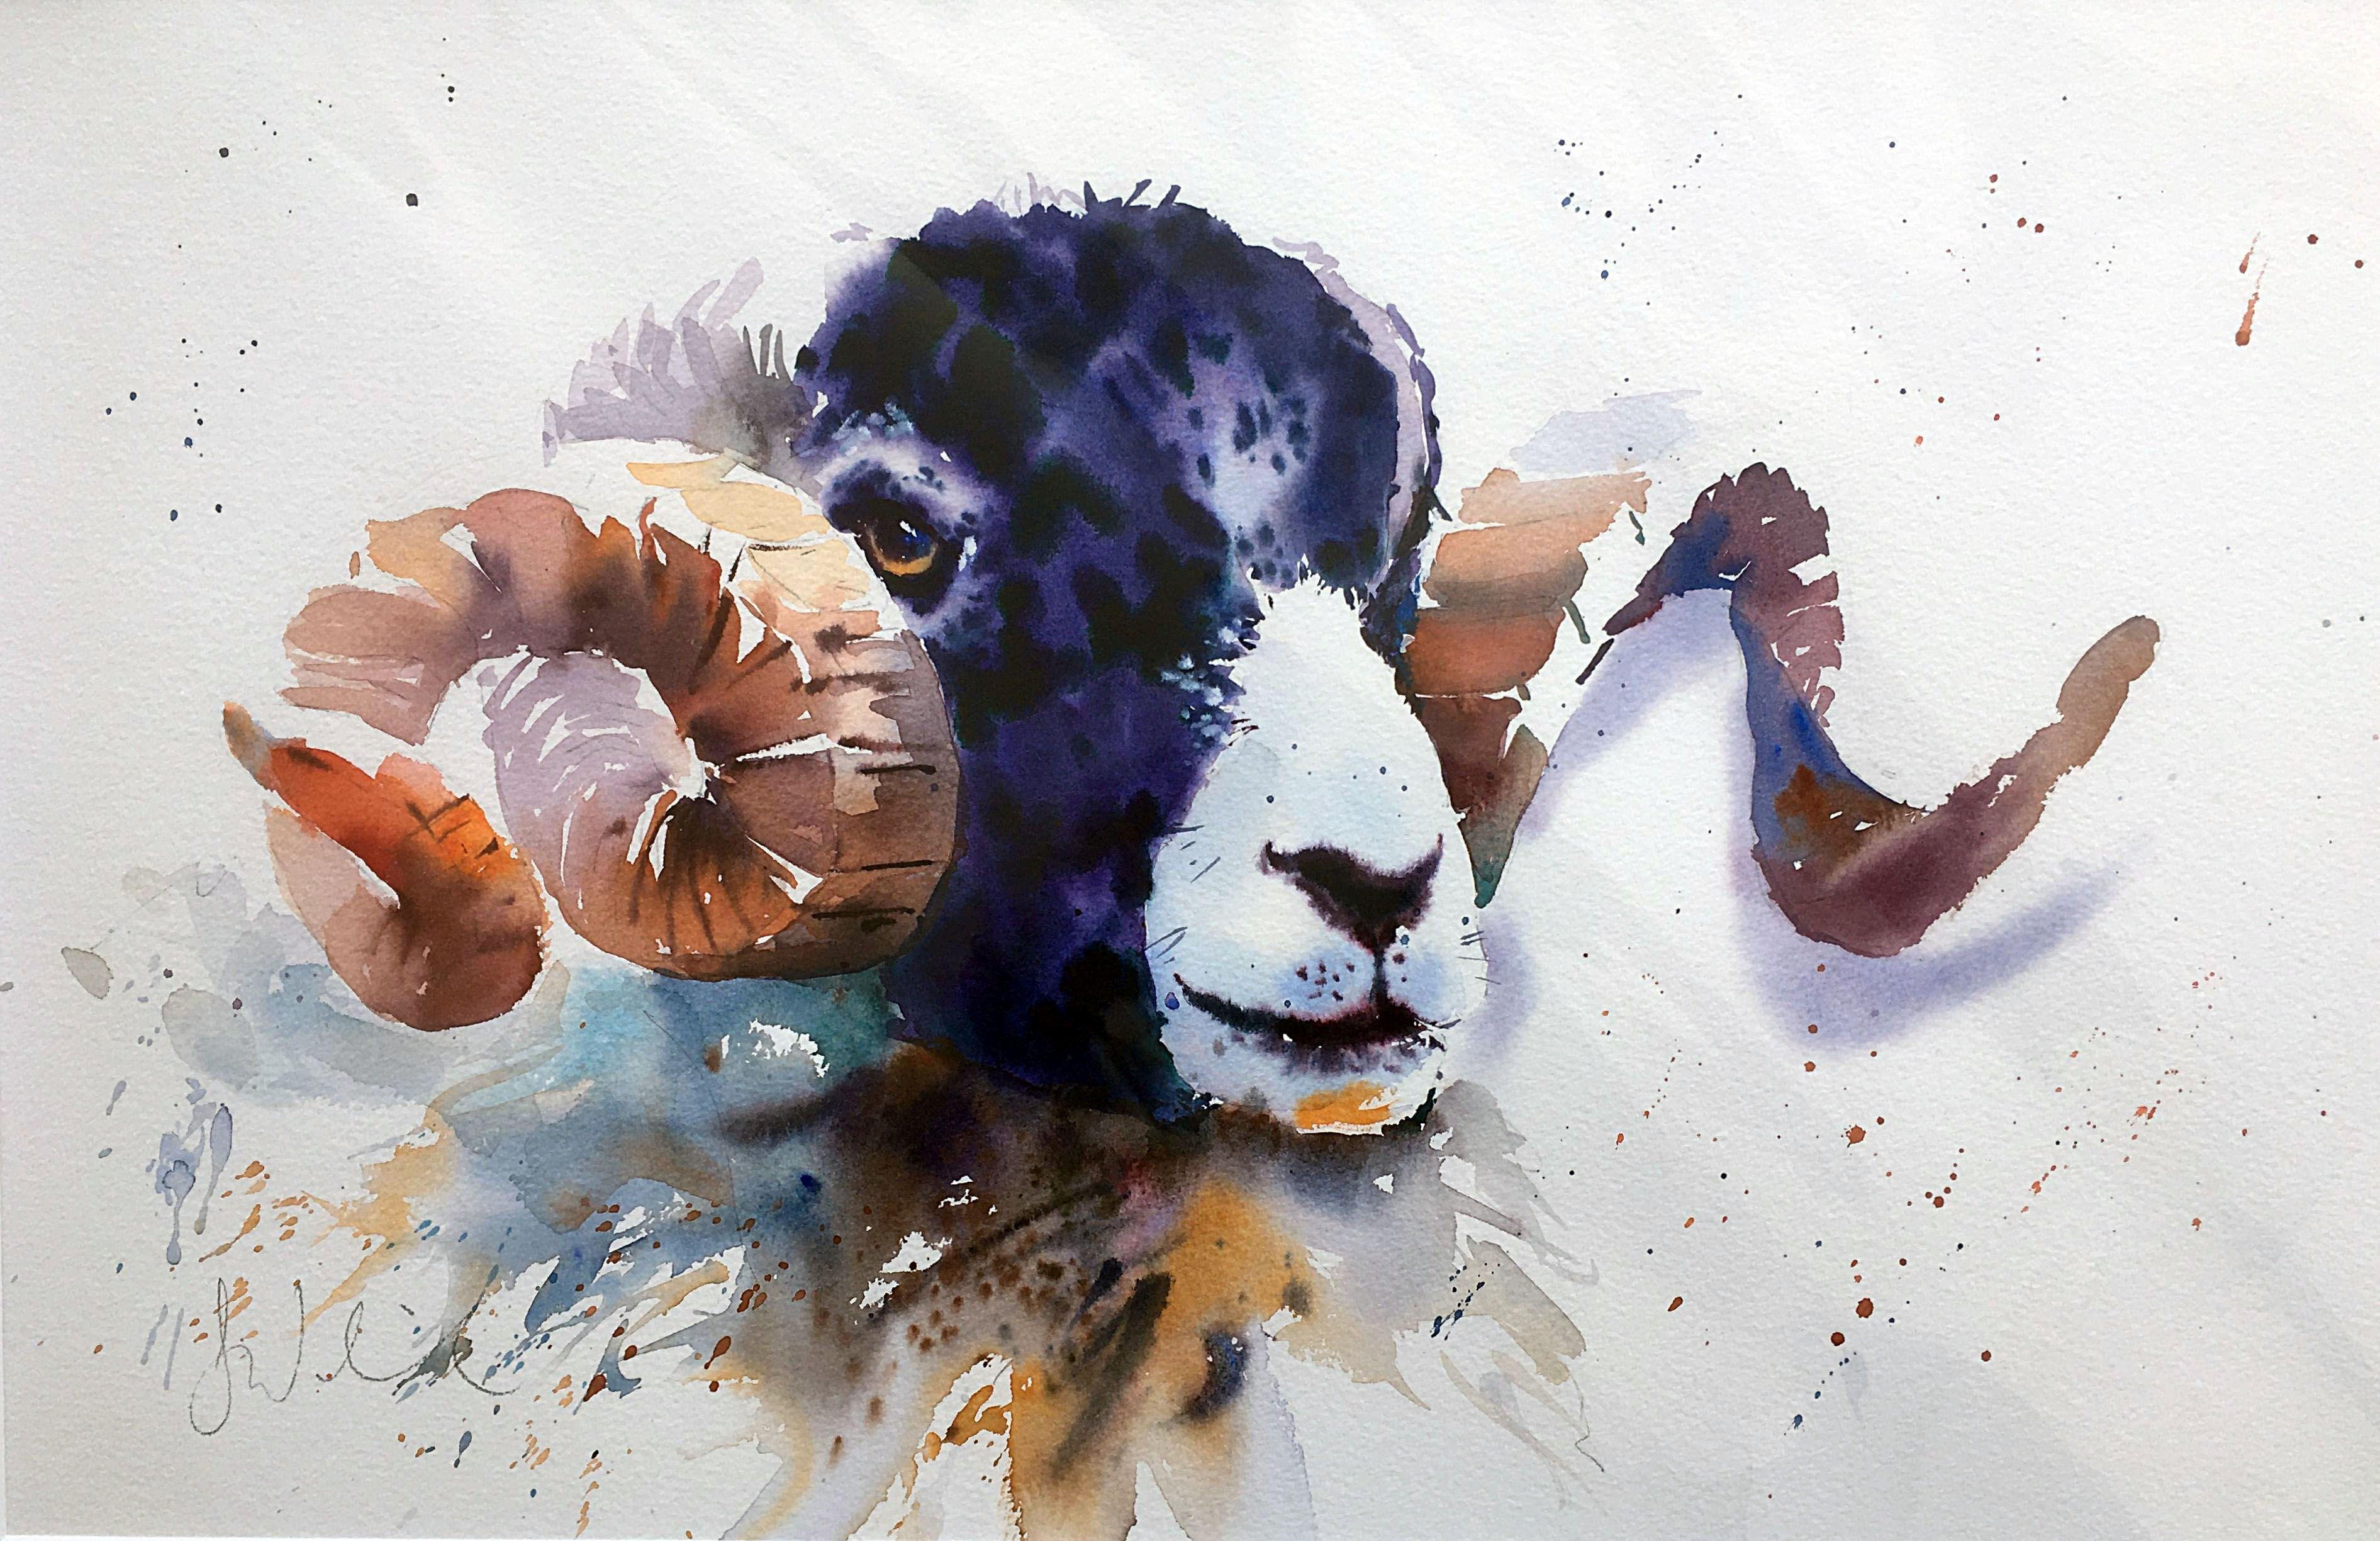 Regal Ram